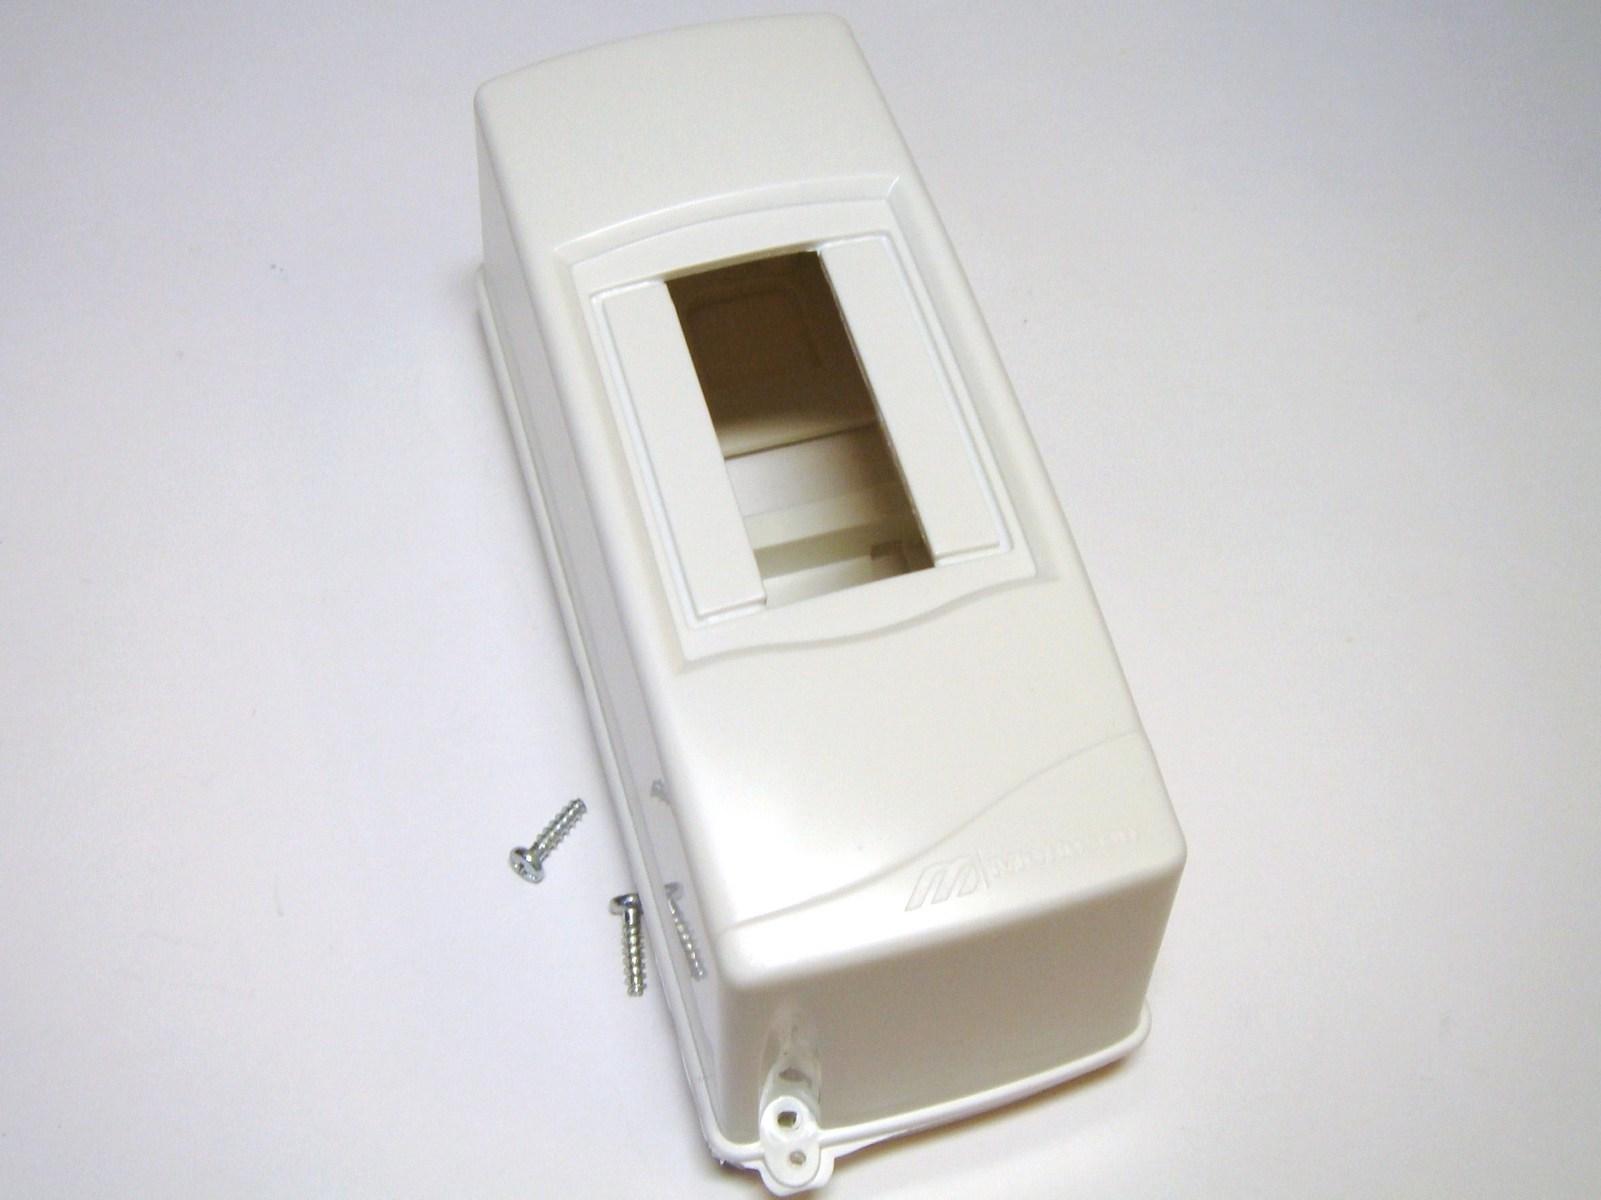 Elektrikilp pinnapealne 2 moodulit, Mutlusan electric, Meksbox